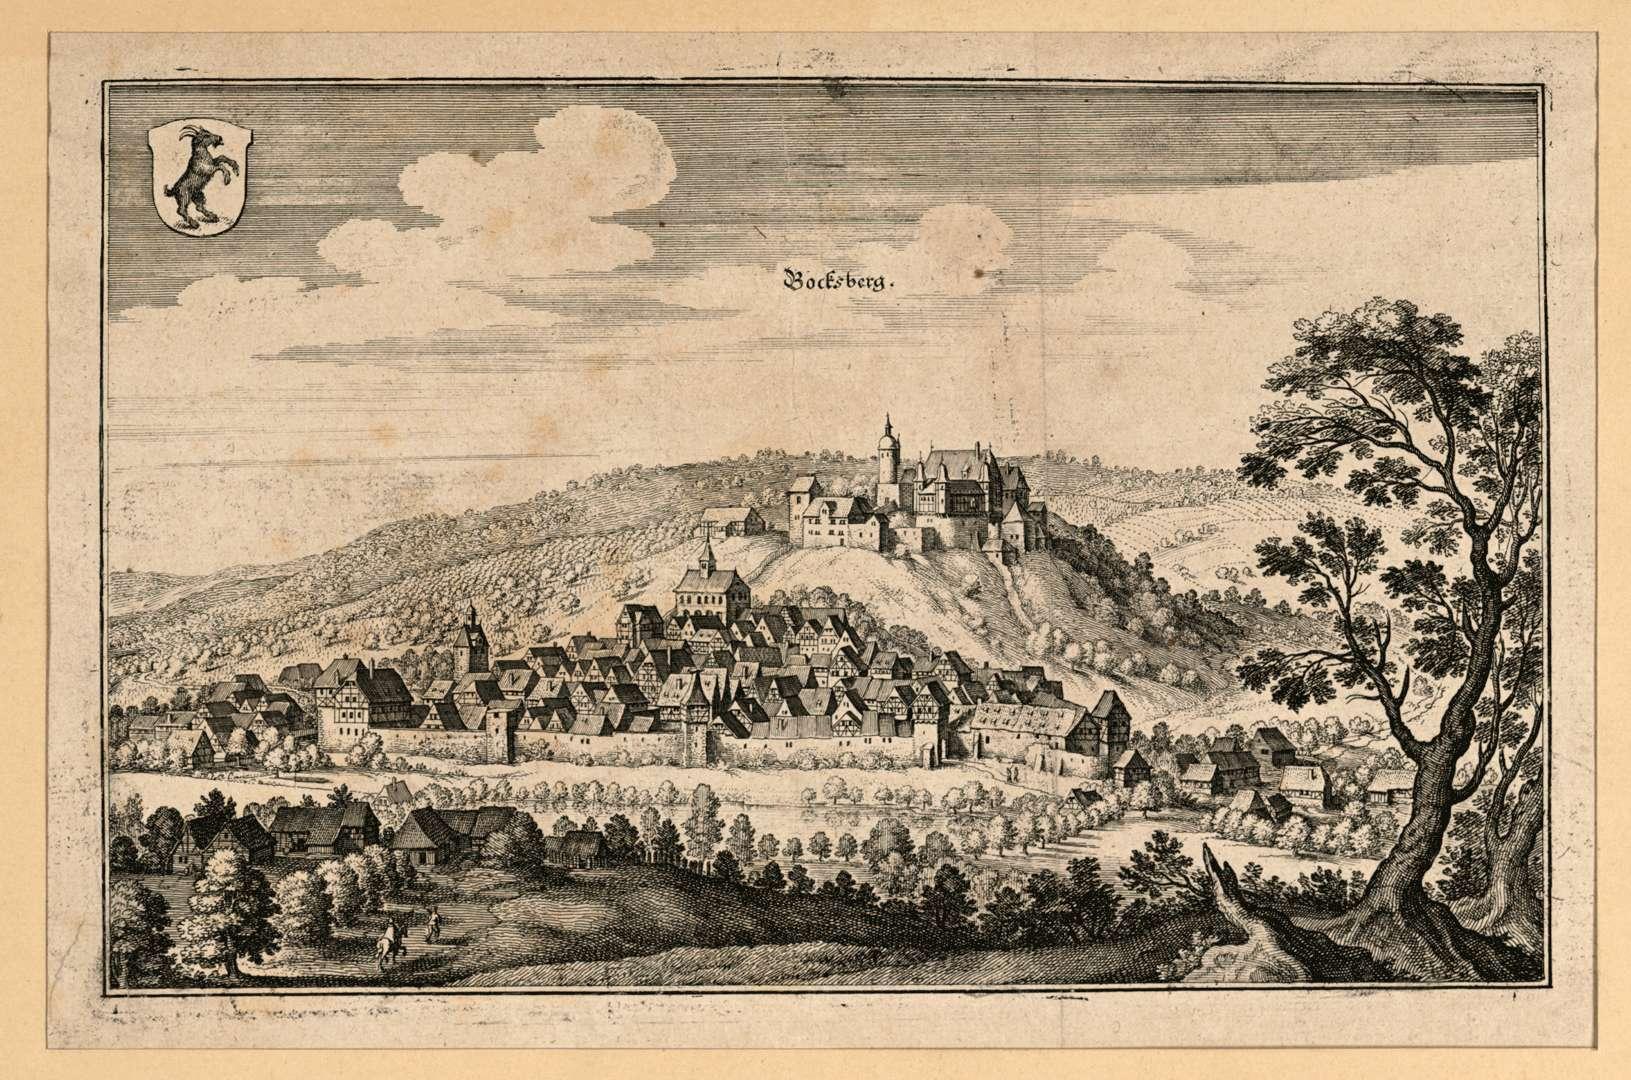 Bocksberg, Bild 1